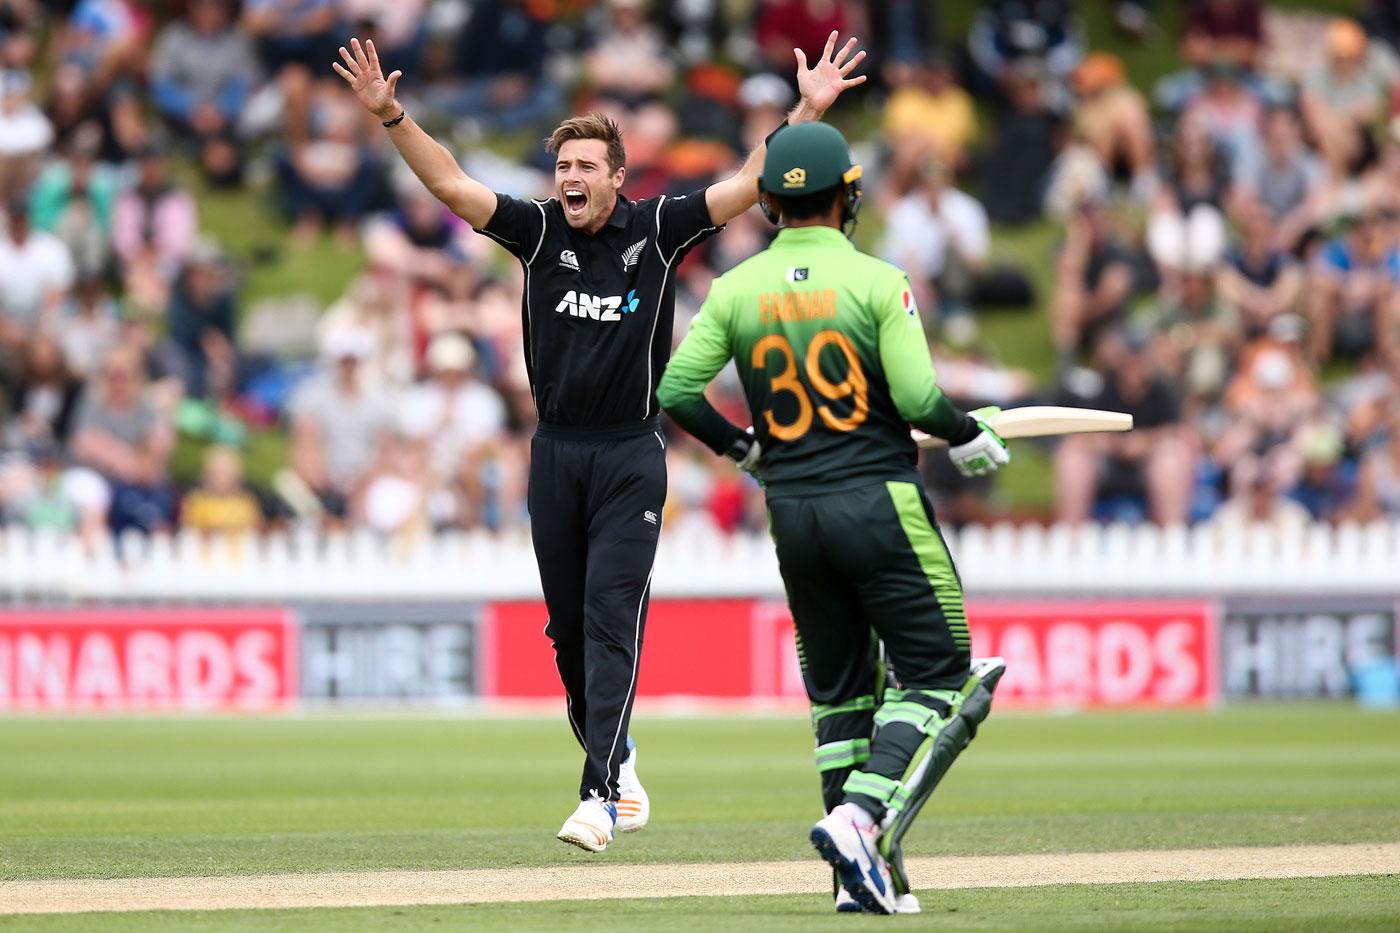 Pakistan vs New Zealand 1st ODI Highlights